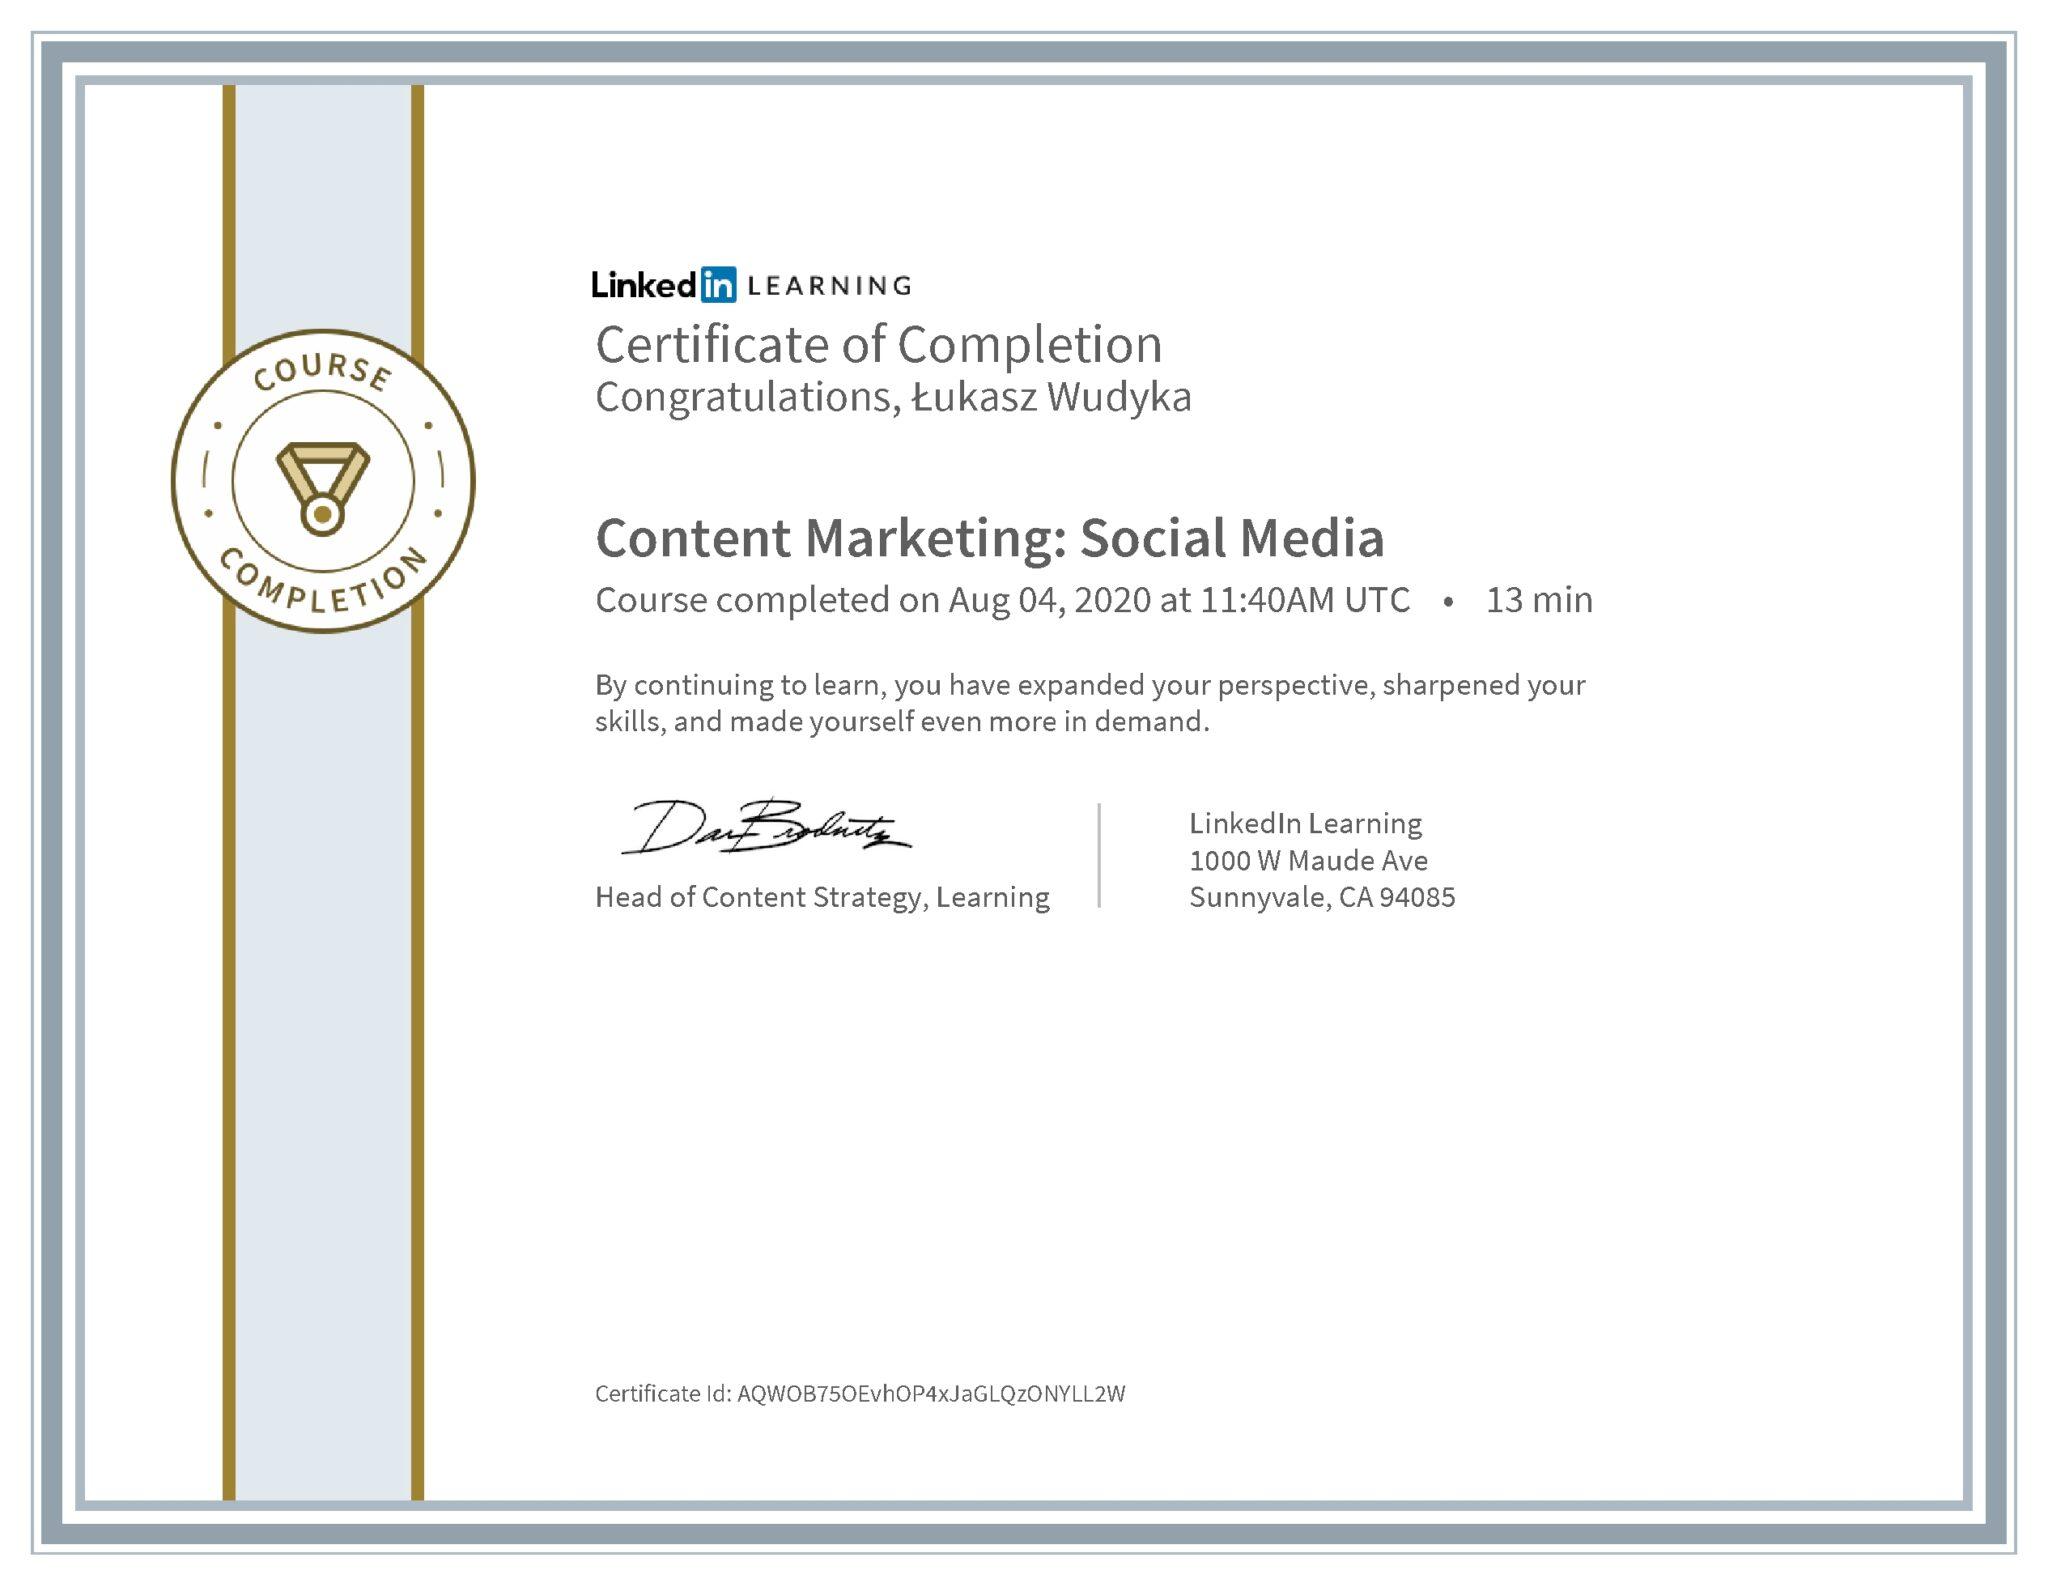 Łukasz Wudyka certyfikat LinkedIn Content Marketing: Social Media